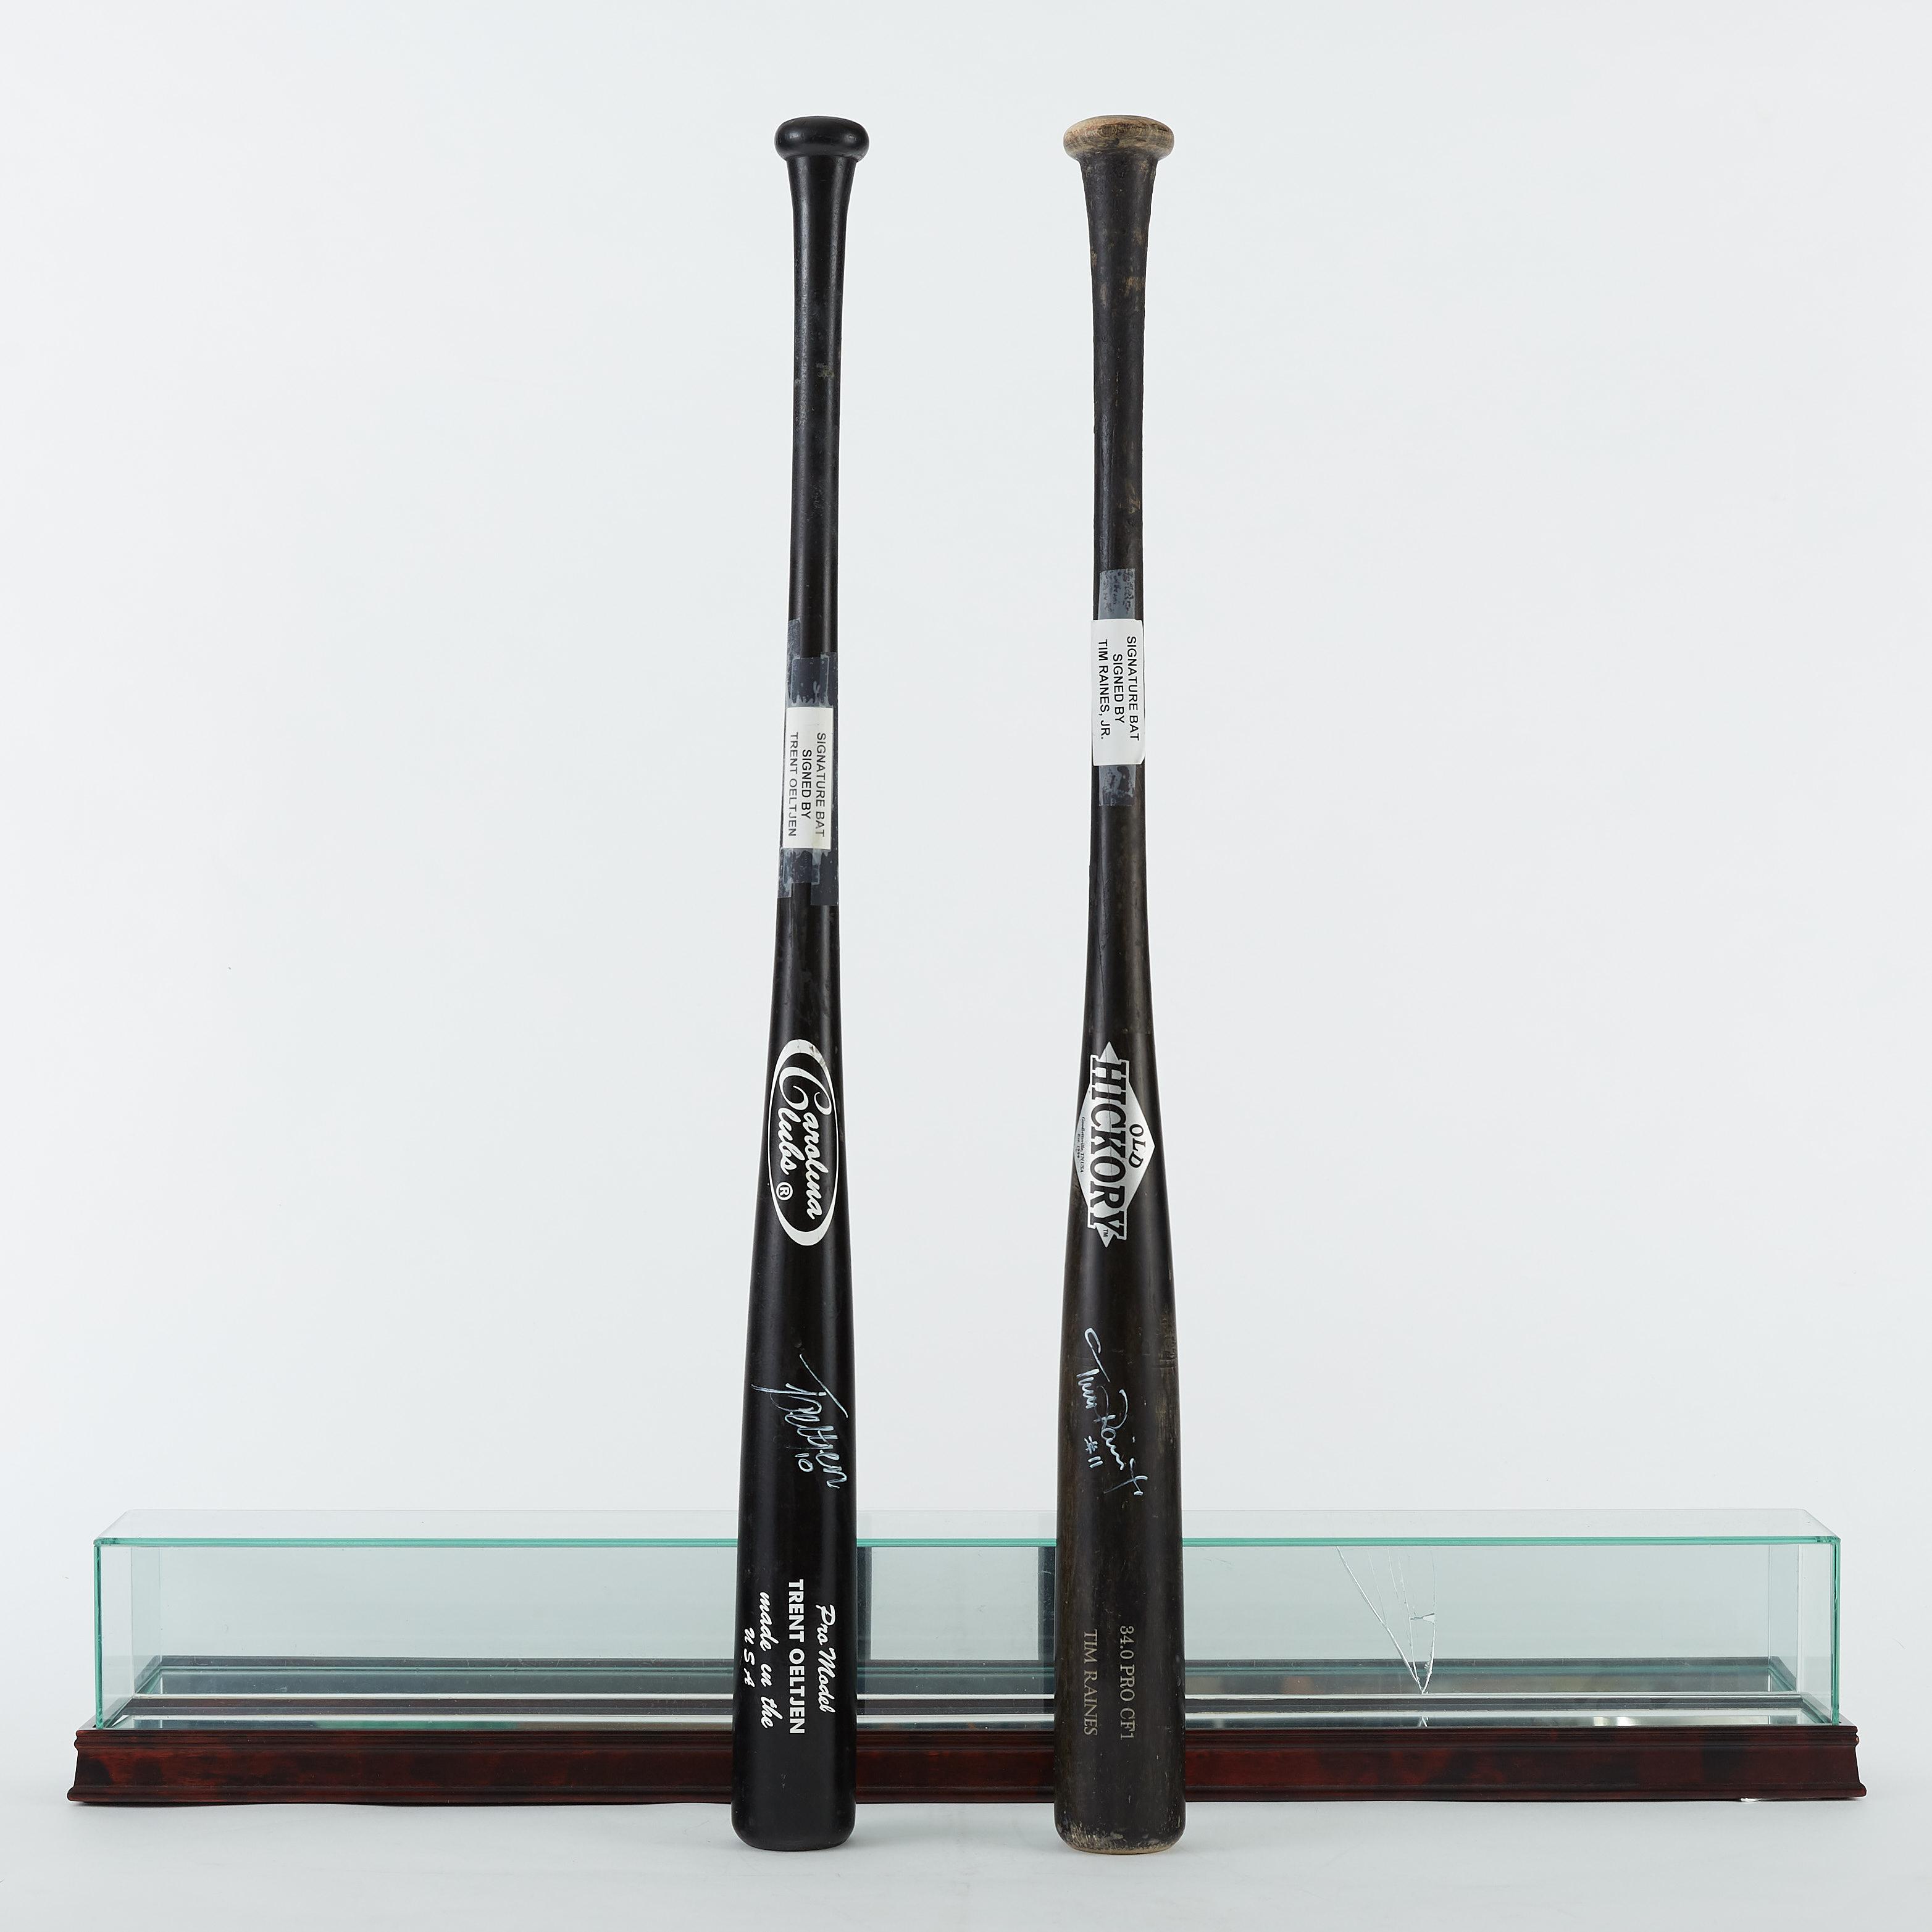 Lot 271: 2 Signed Game Used Baseball Bats Tim Raines